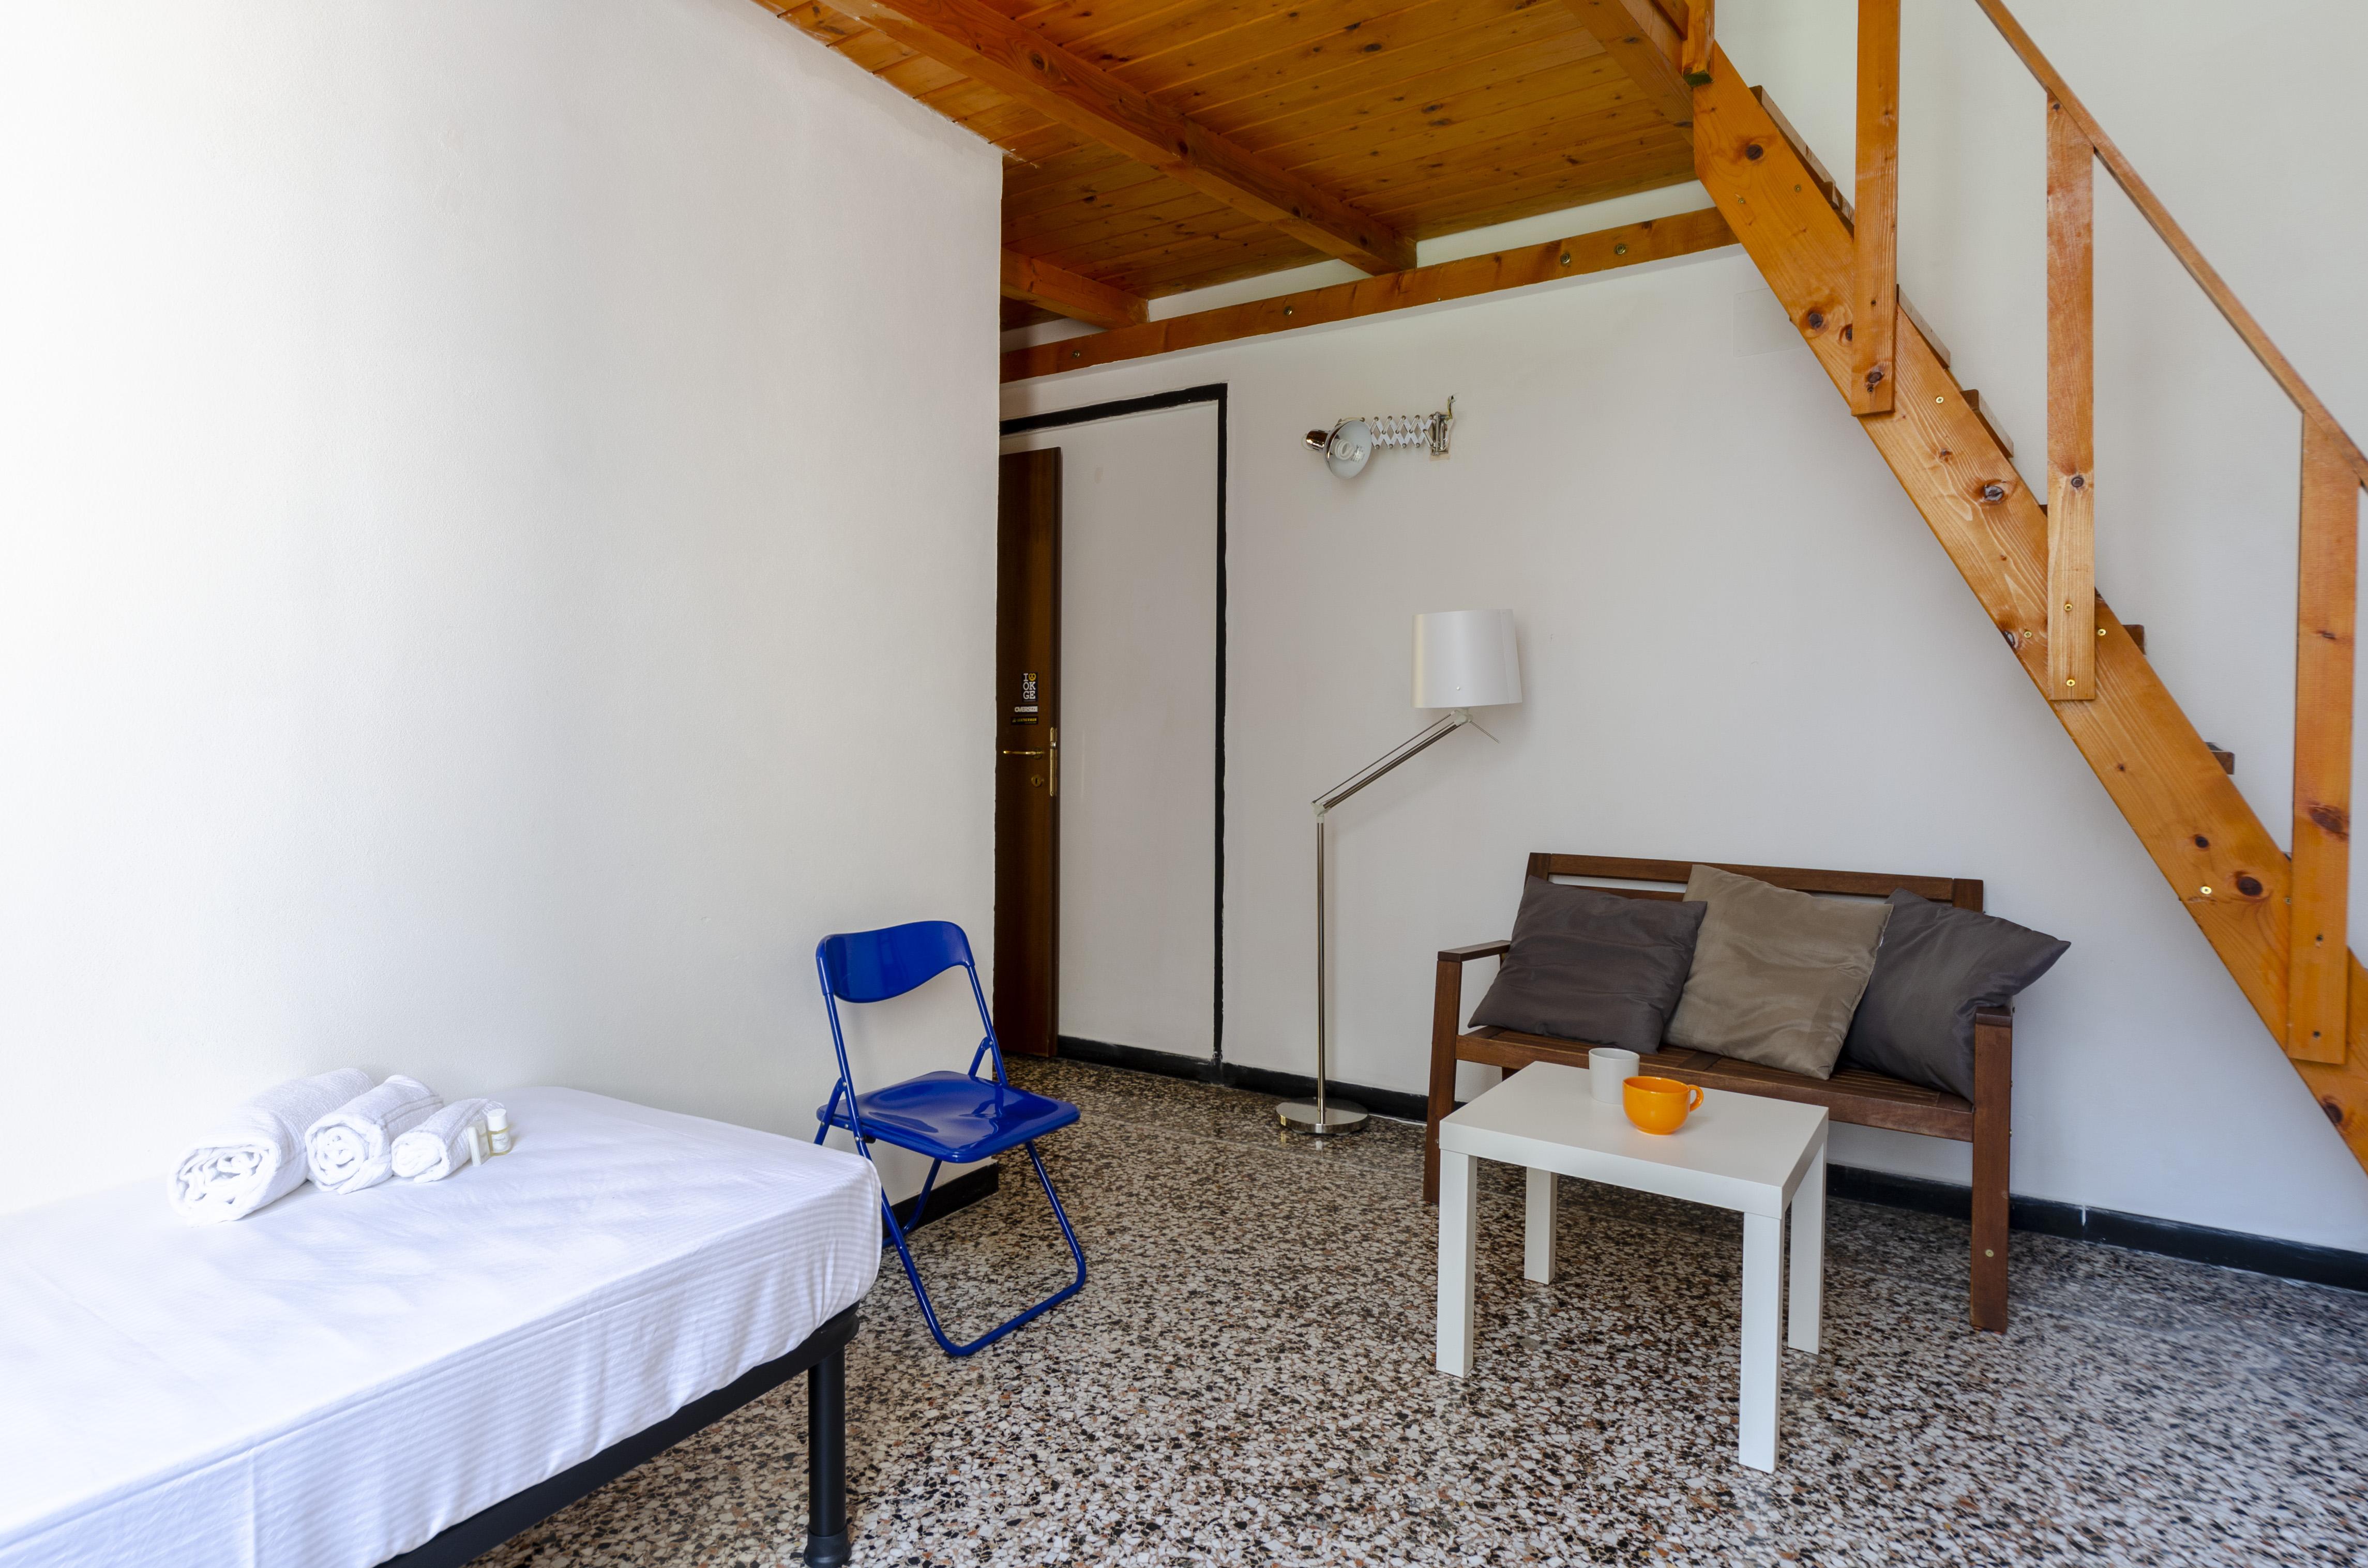 Apartment Hintown Piazza del Roso Genova Universitaria photo 18513793